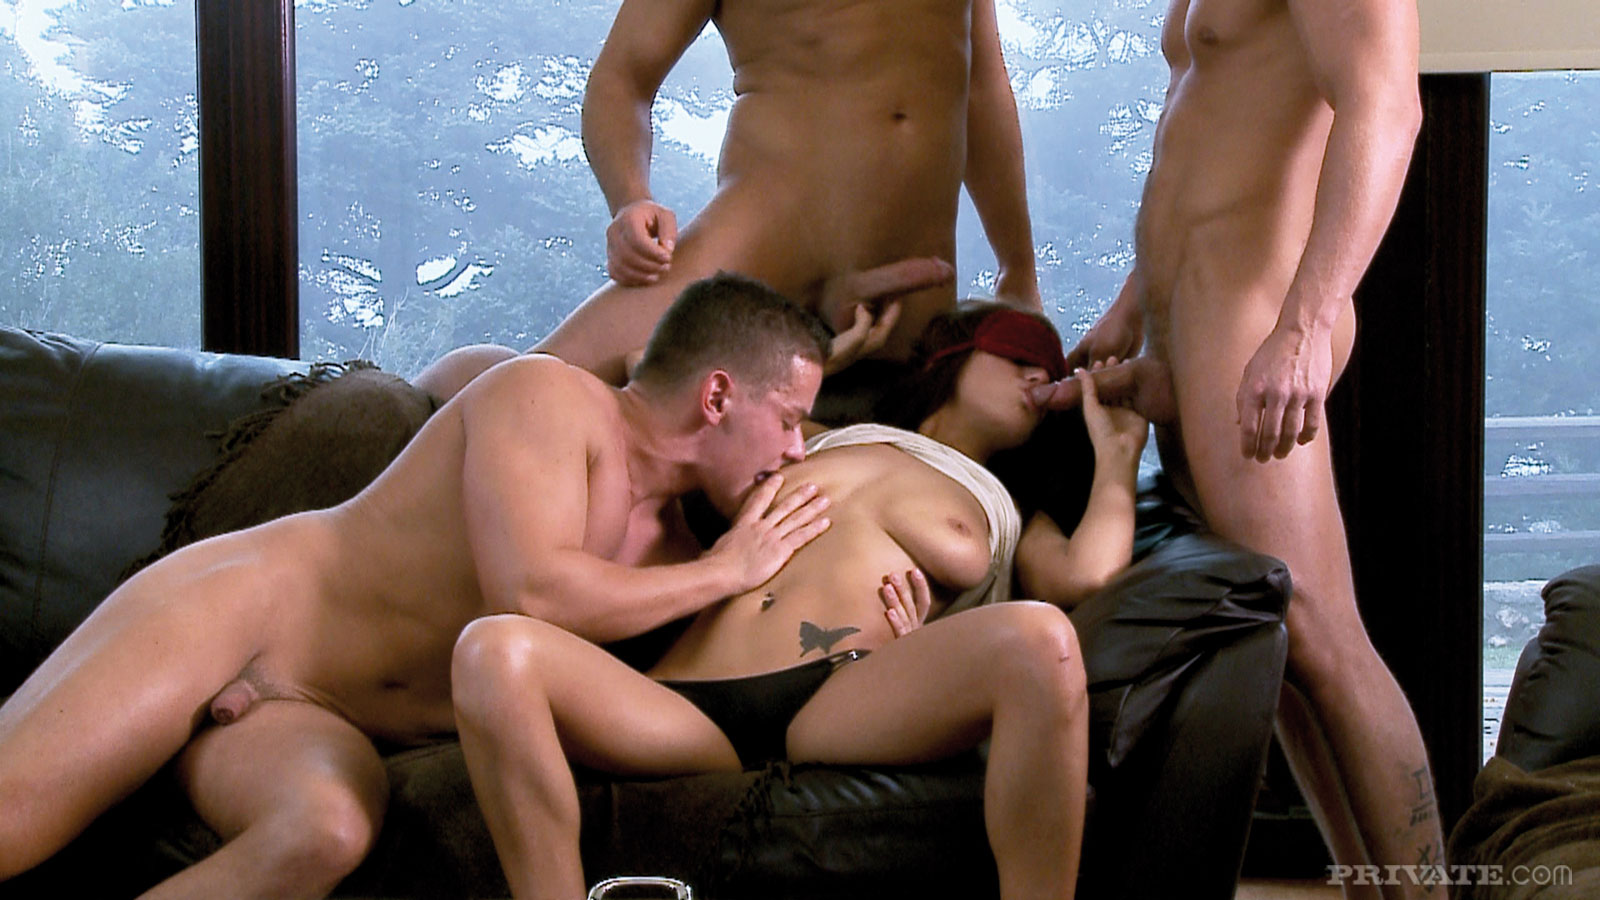 sex onlineshop berlin nightclub sex